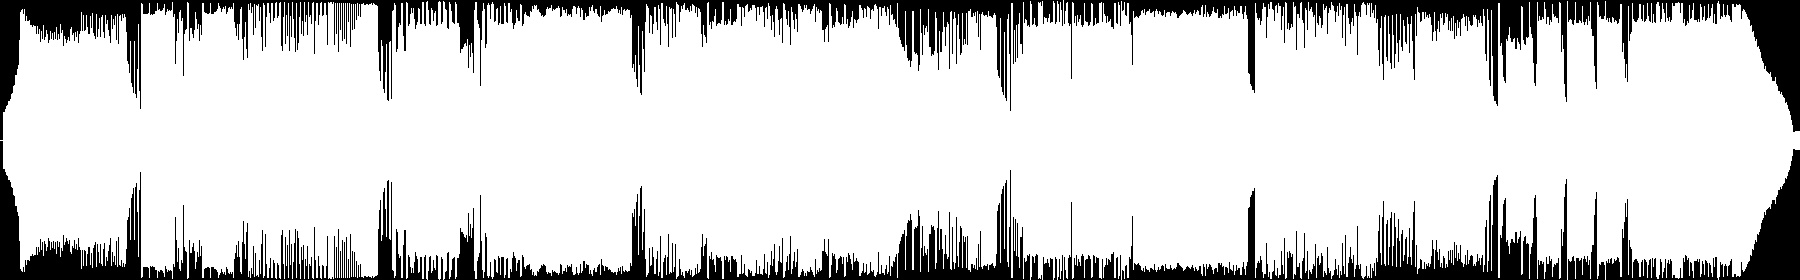 Riddim Trap Evolution audio waveform